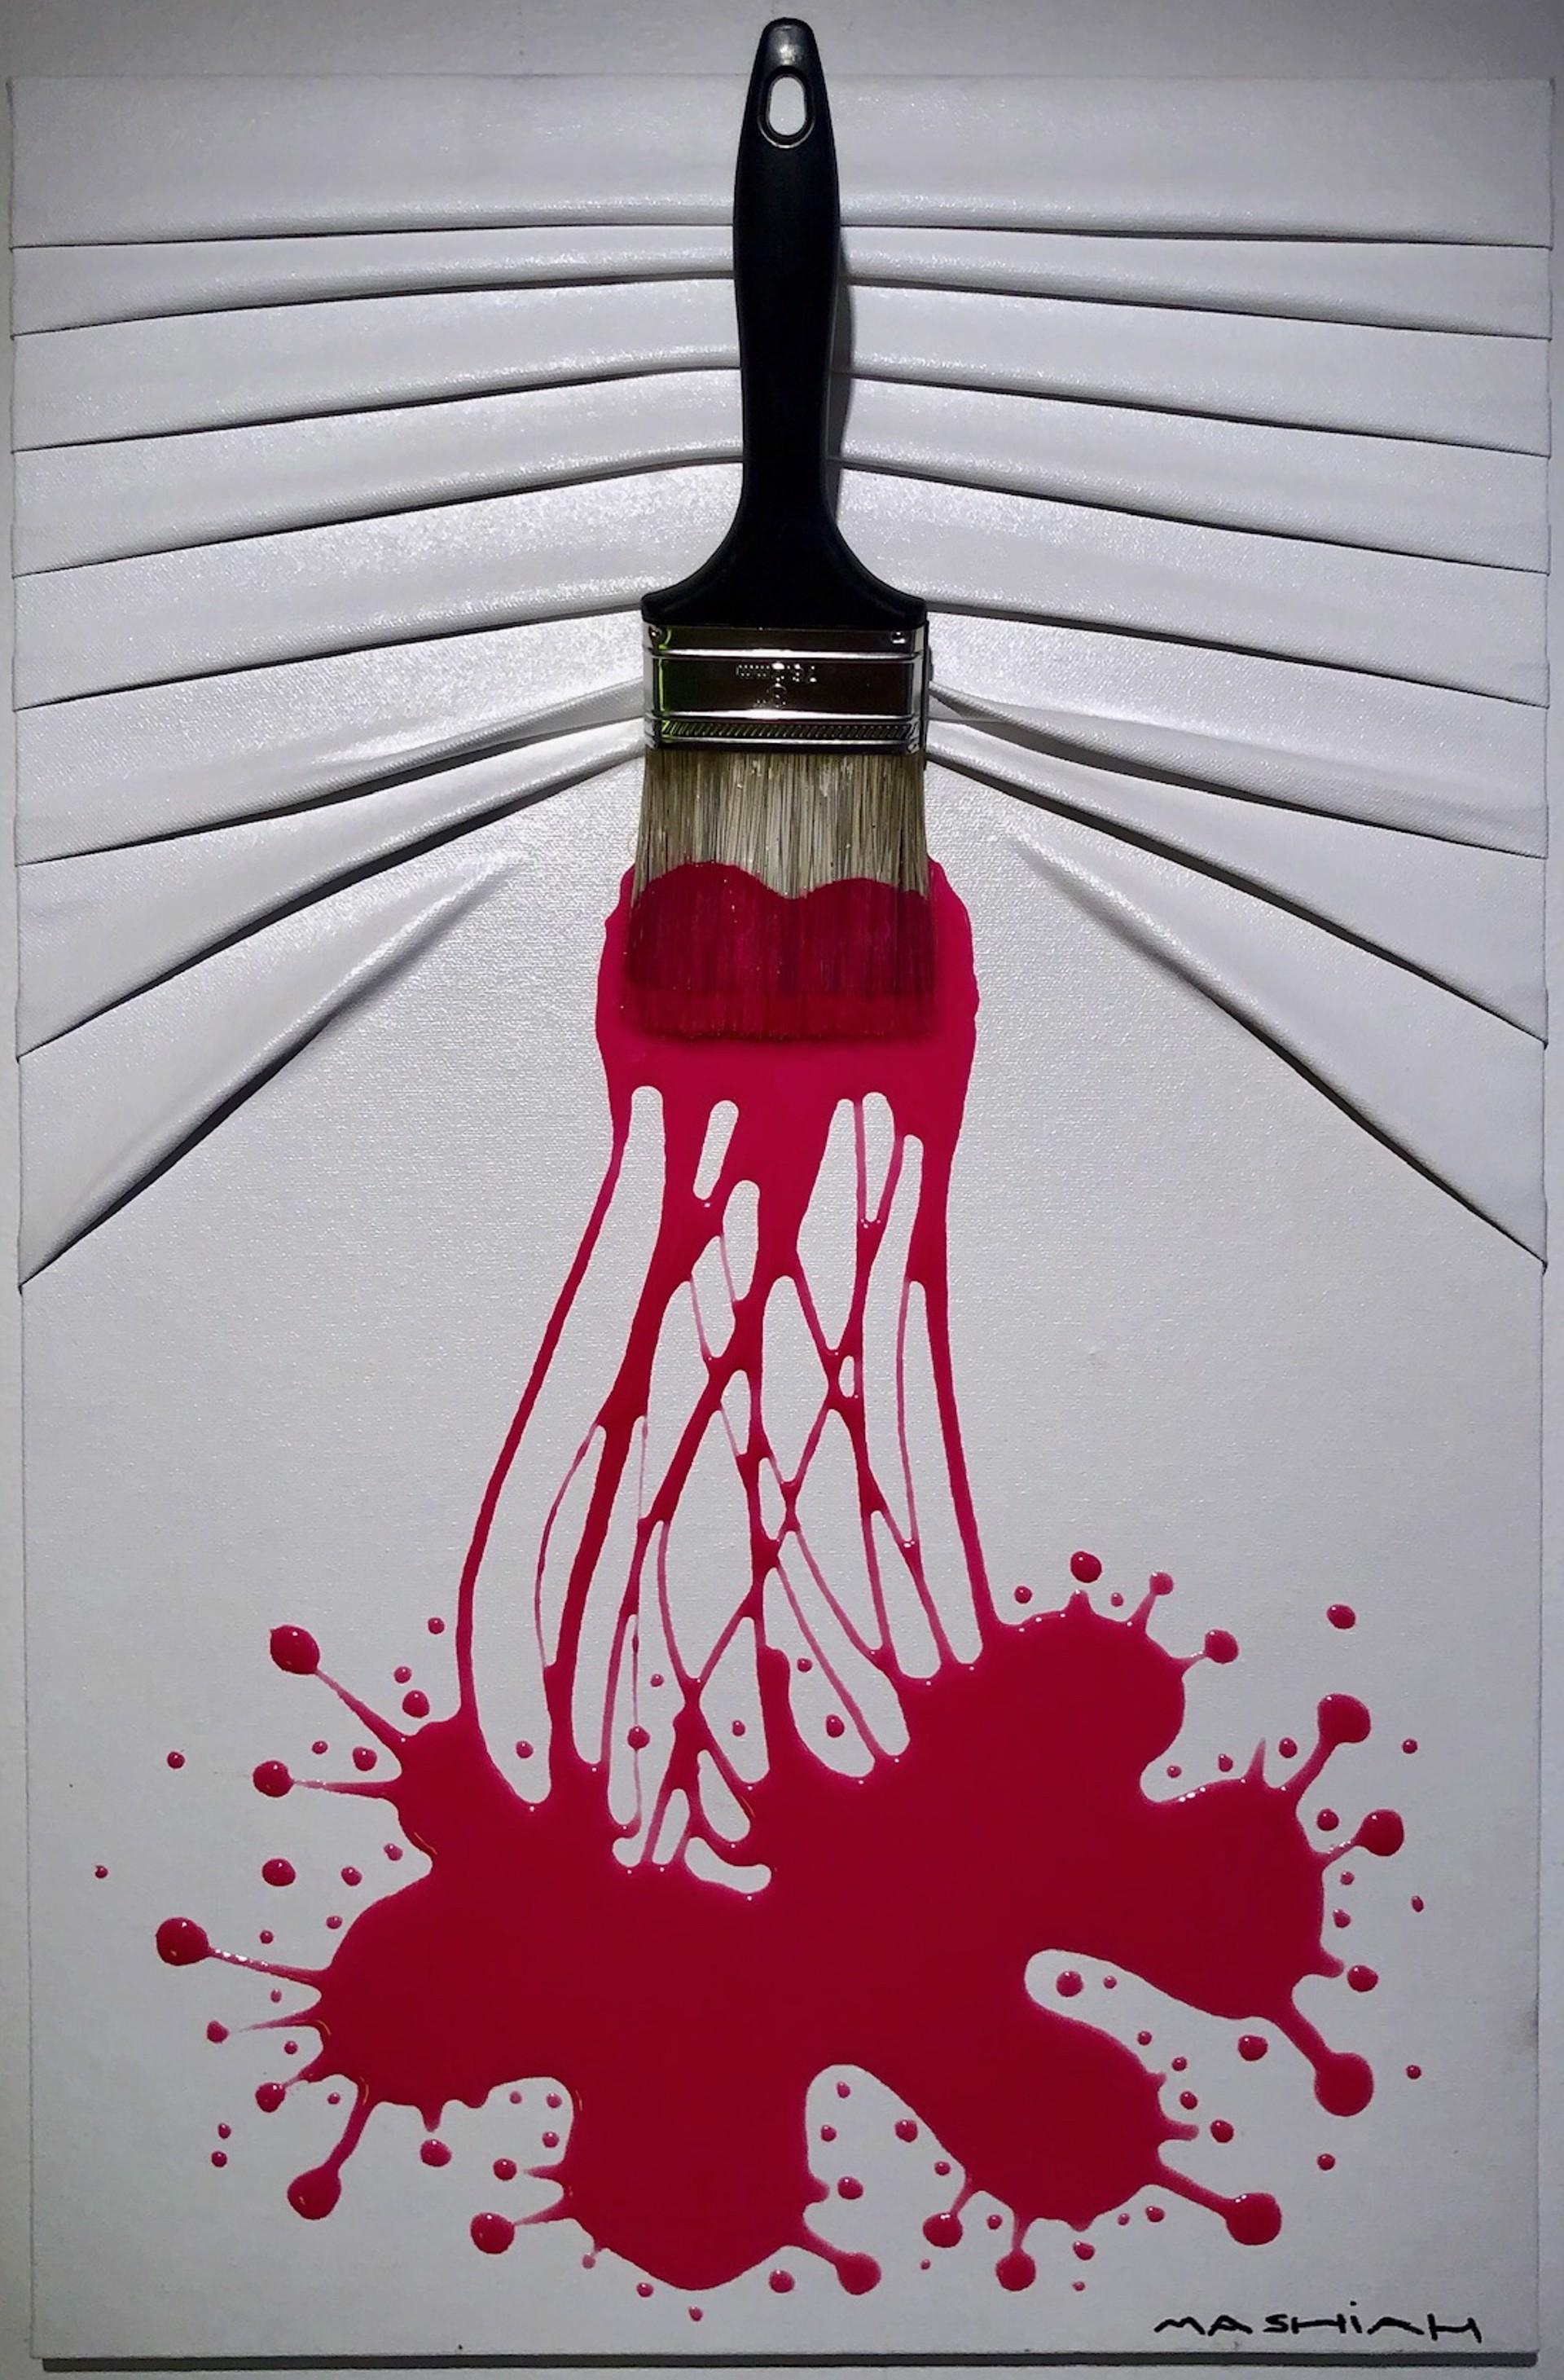 """Let's Paint"" small, Red splash on White by Efi Mashiah"